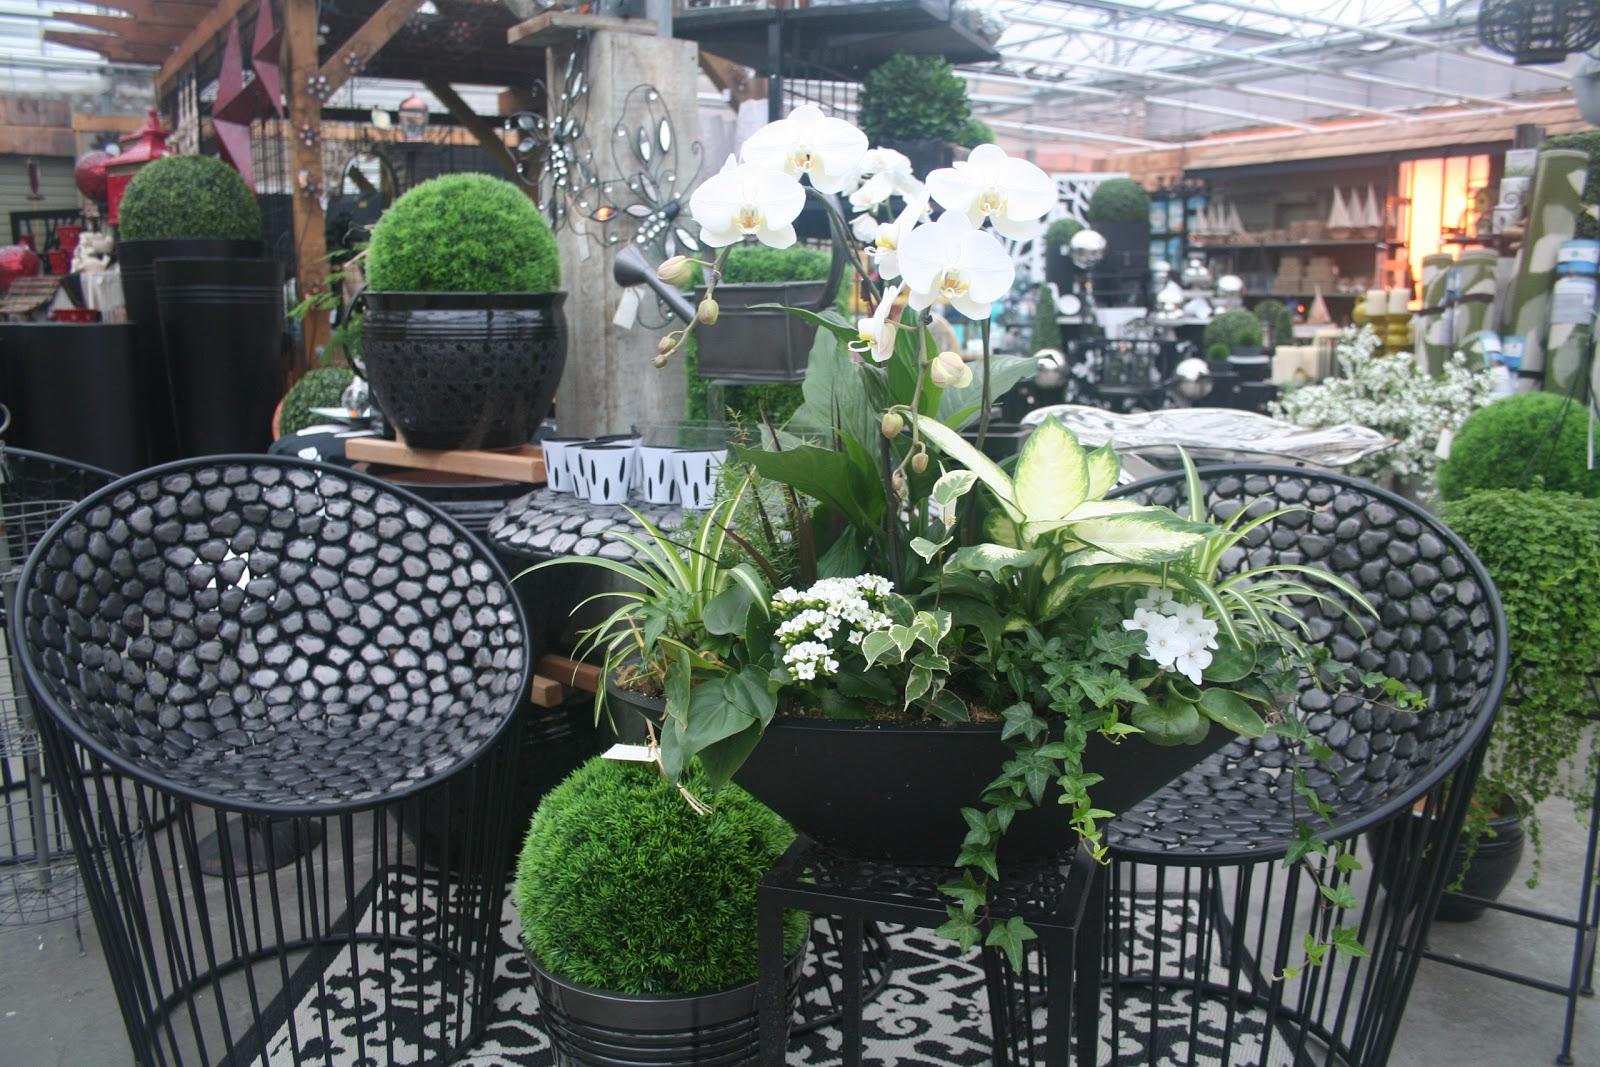 West Coast Gardens: Home and Garden Decor